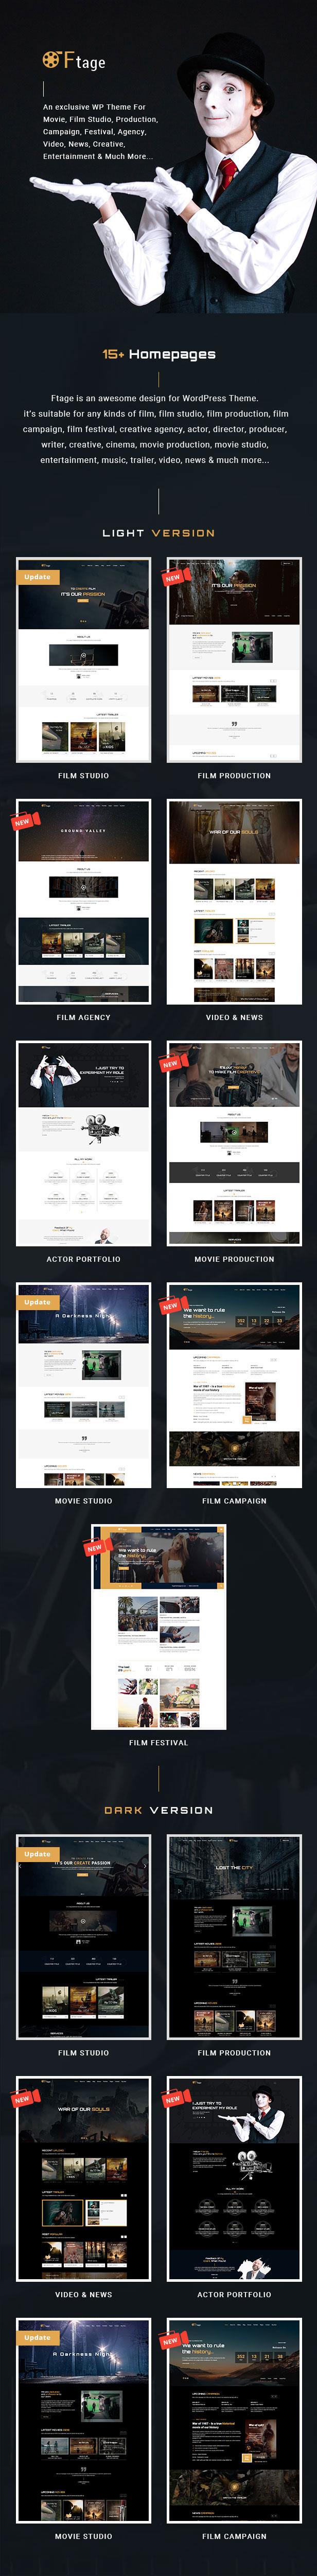 Movie Production & Film Studio WordPress Theme - Ftage - 1